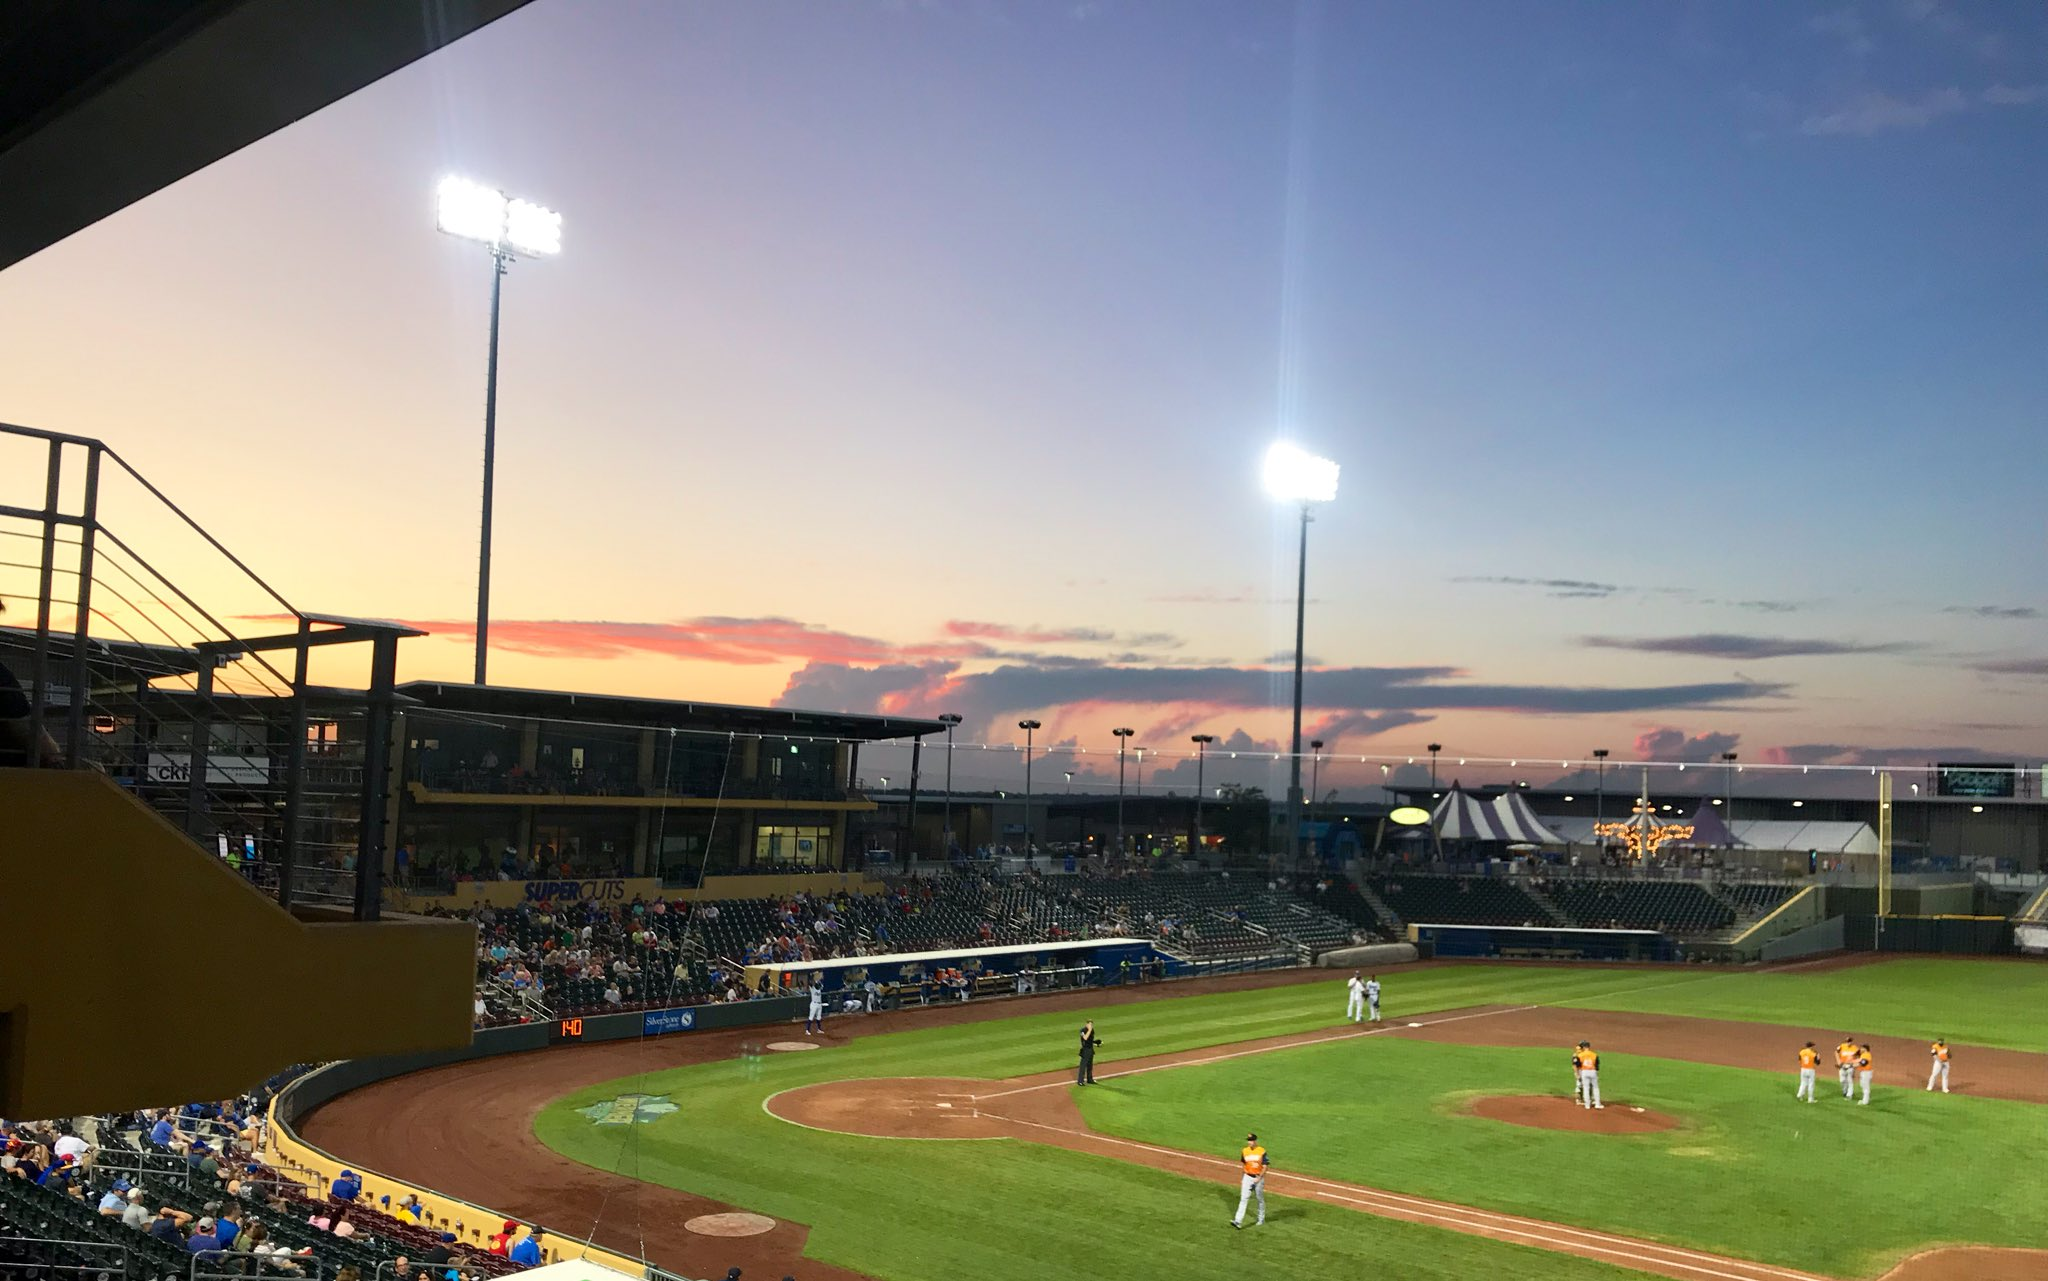 Nightly #BaseballSkies Appreciation Tweet 😍 https://t.co/Rz8hlajgDS